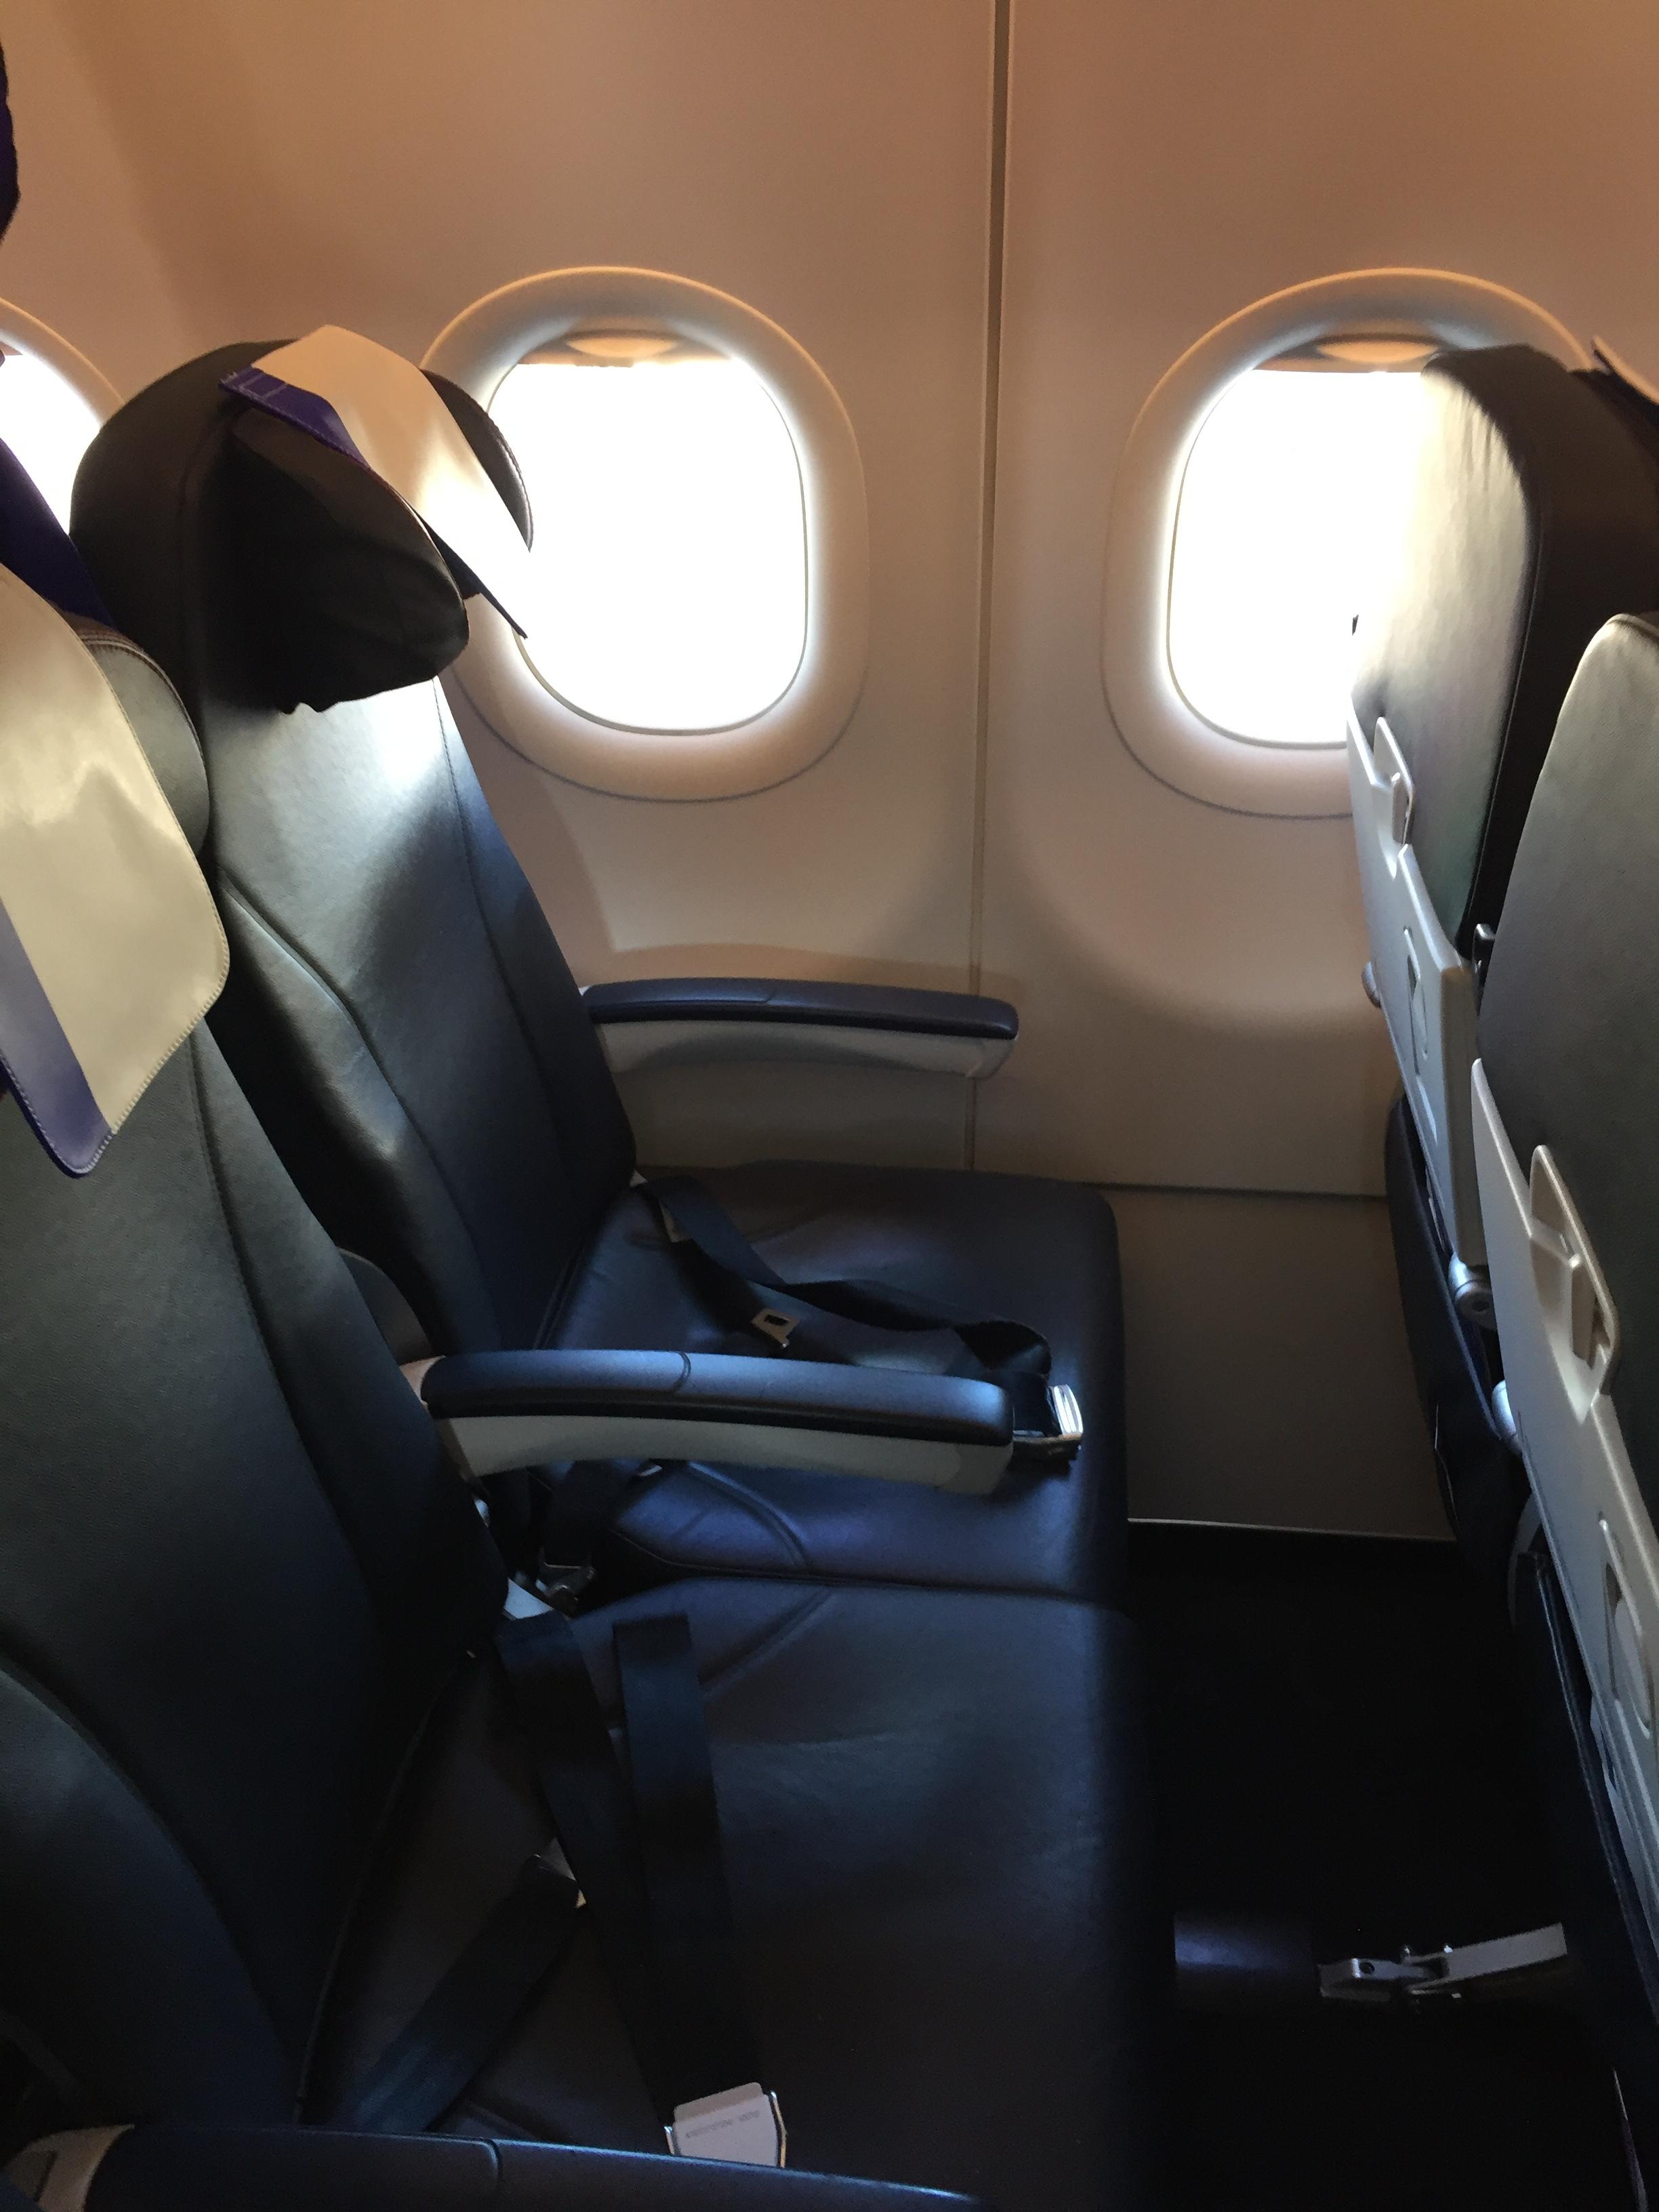 joon seats.JPG